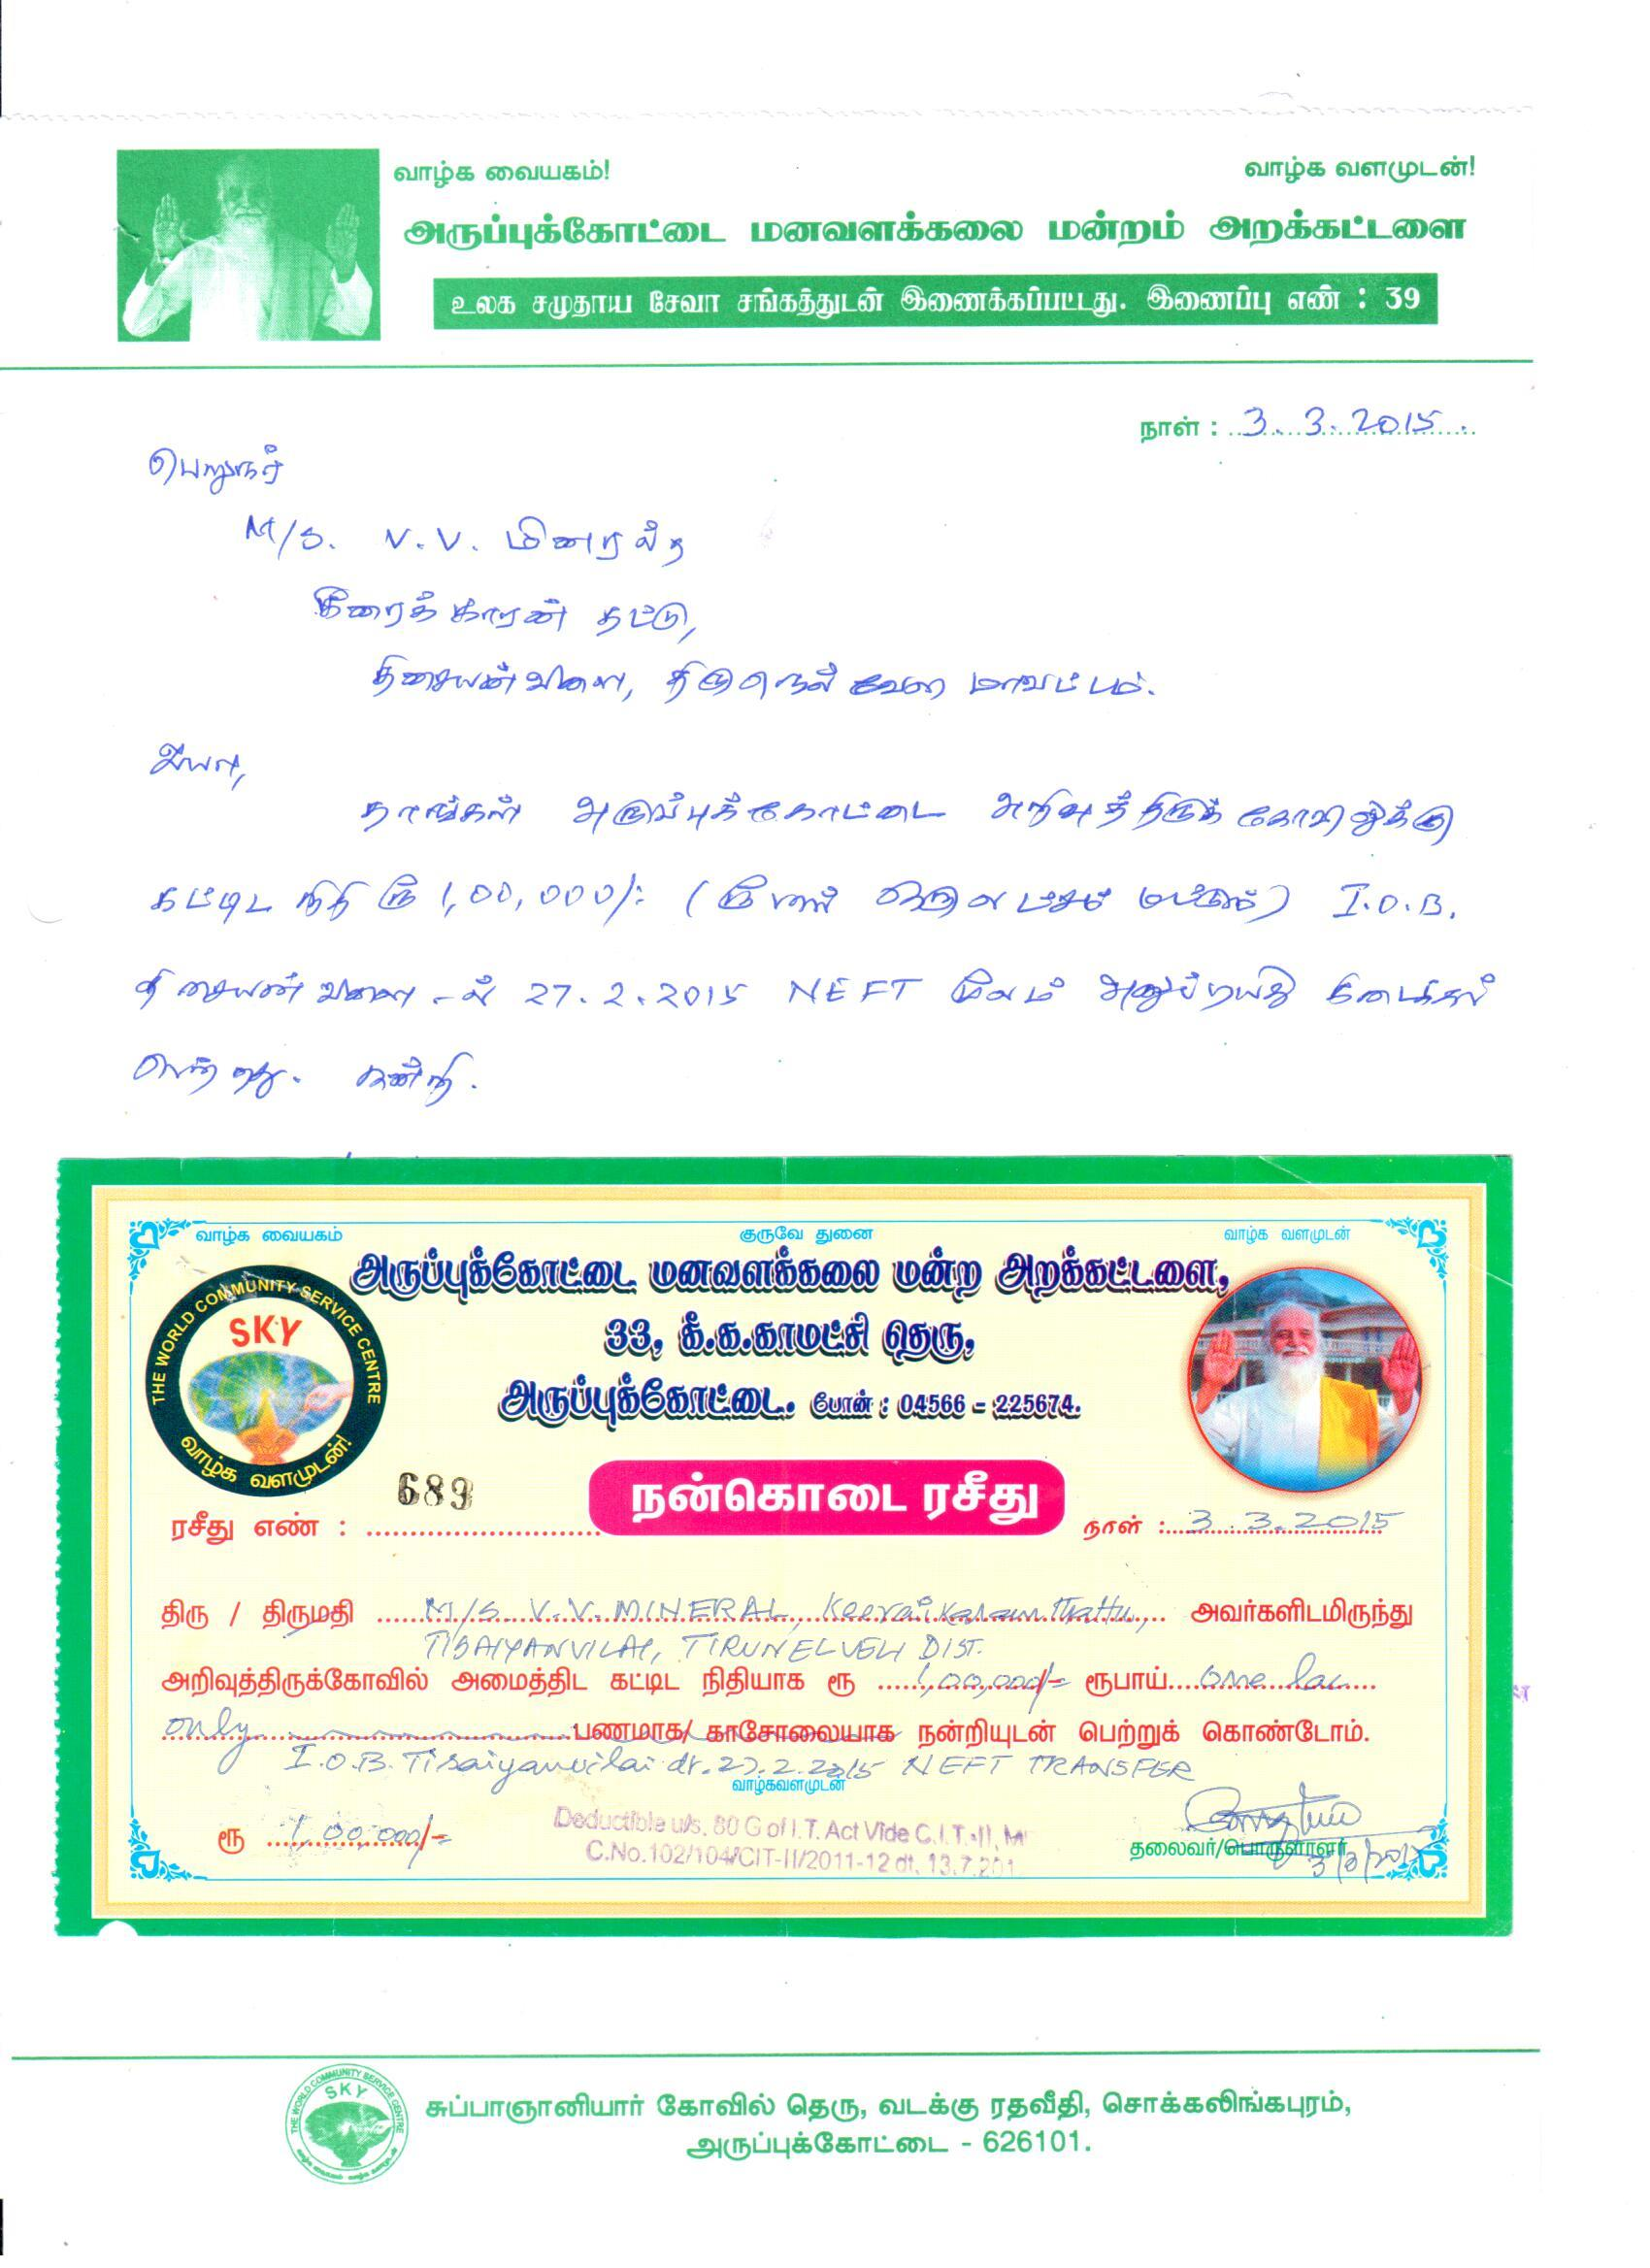 Arupukottai Donation Receipt 2014-15 - 3.3.15